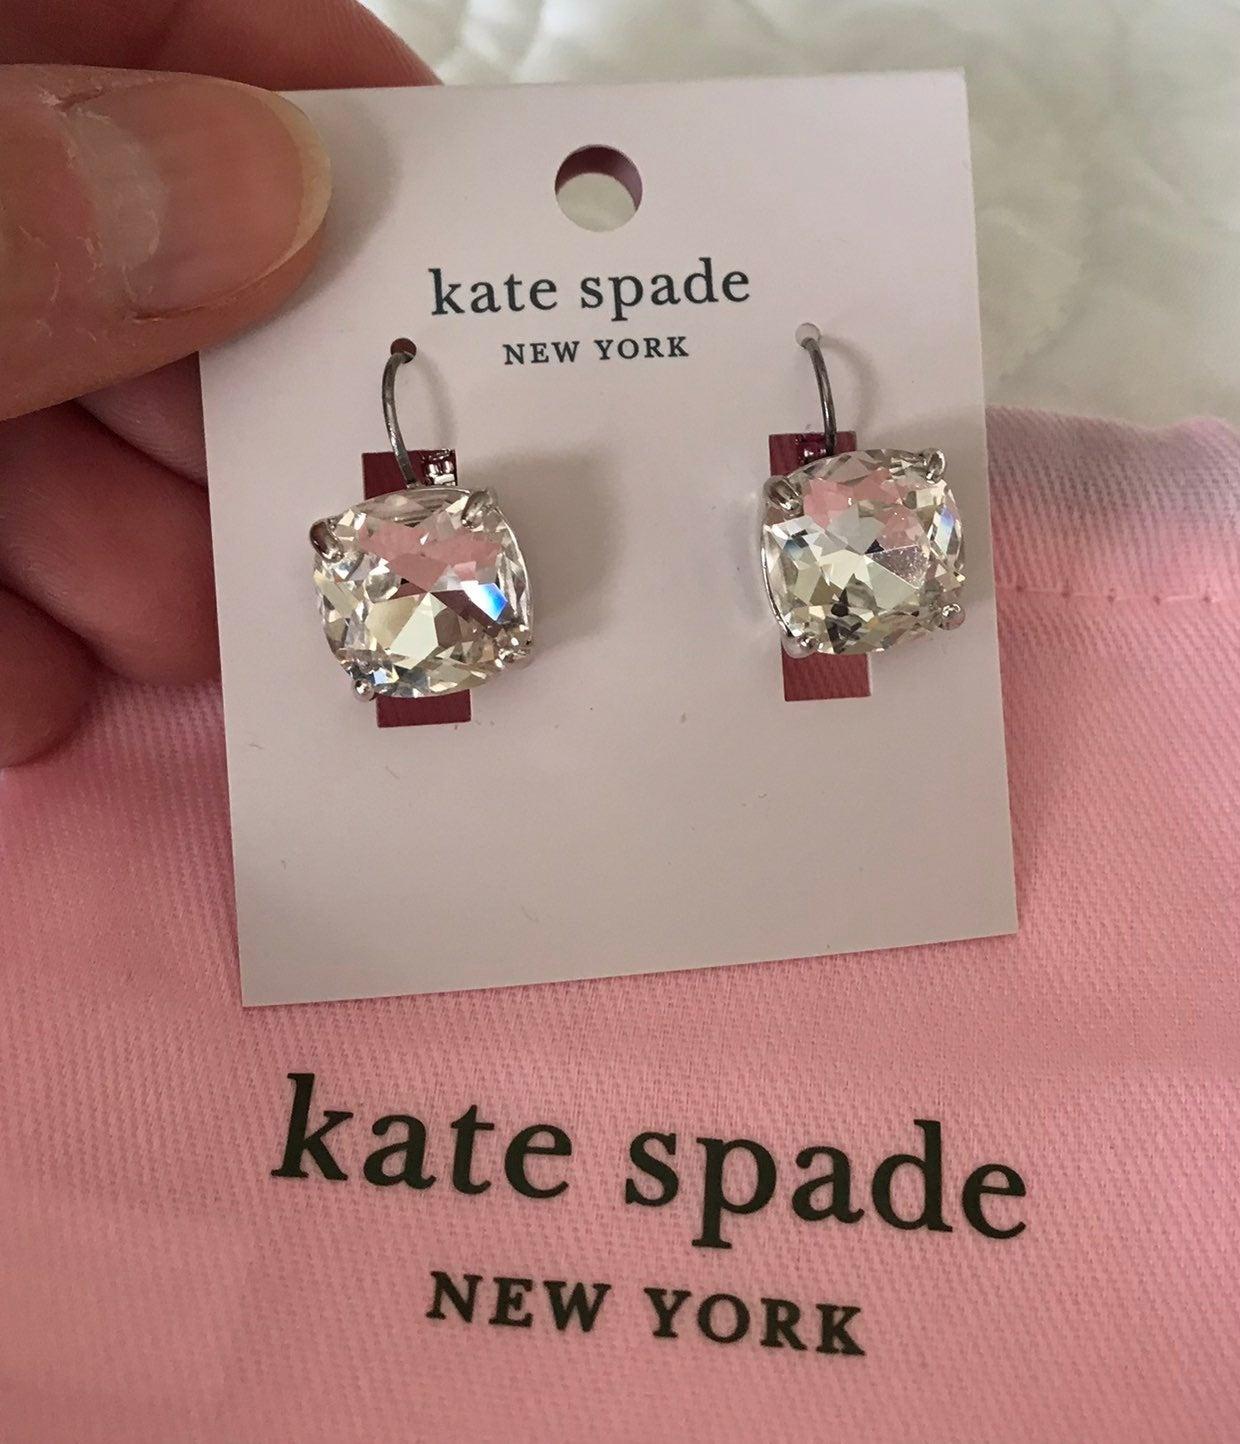 NWT Kate Spade CLEAR SQUARE CZ EARRINGS